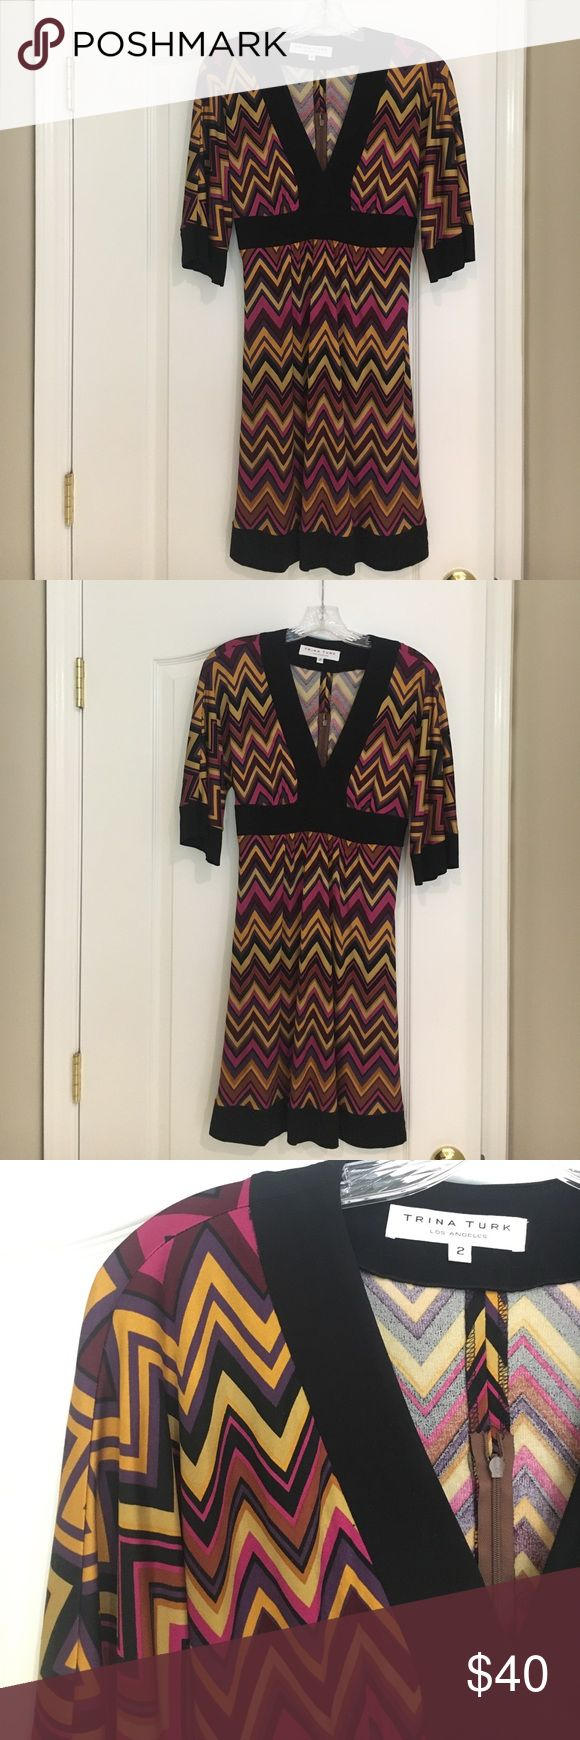 Trina Turk dress Size 2 Trina Turk chevron pattern dress size 2. No-show zipper on back. Dress is 100% Silk/contrast is rayon/spandex. Like new. Trina Turk Style# 279534 Trina Turk Dresses